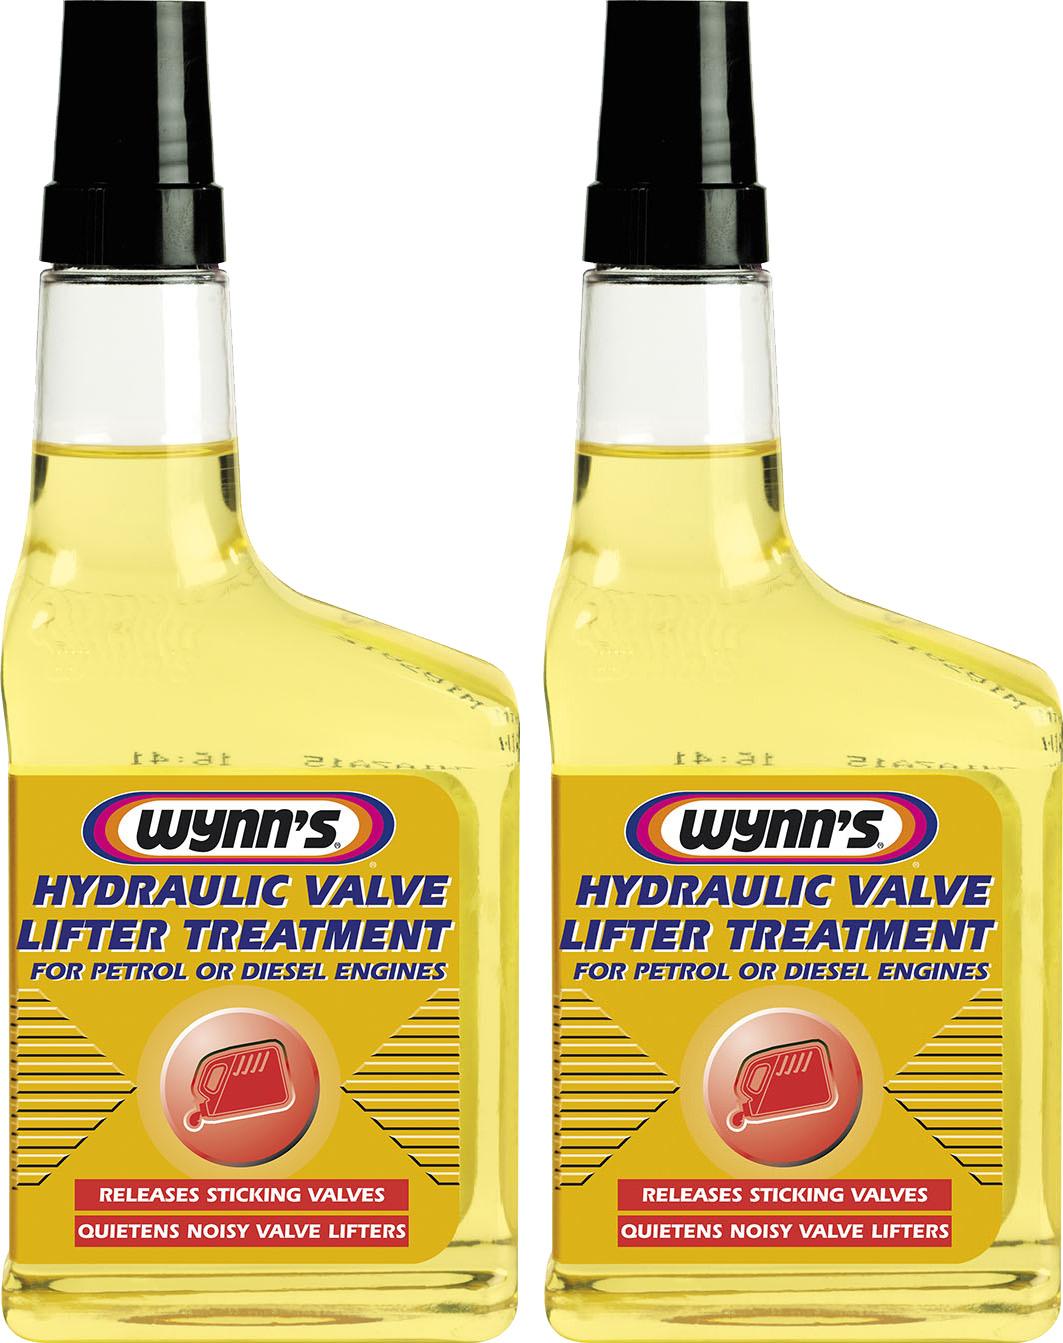 Details about 2x Wynns Hydraulic Valve Lifter Treatment 325ml 76864 Petrol  Diesel Oil Additive